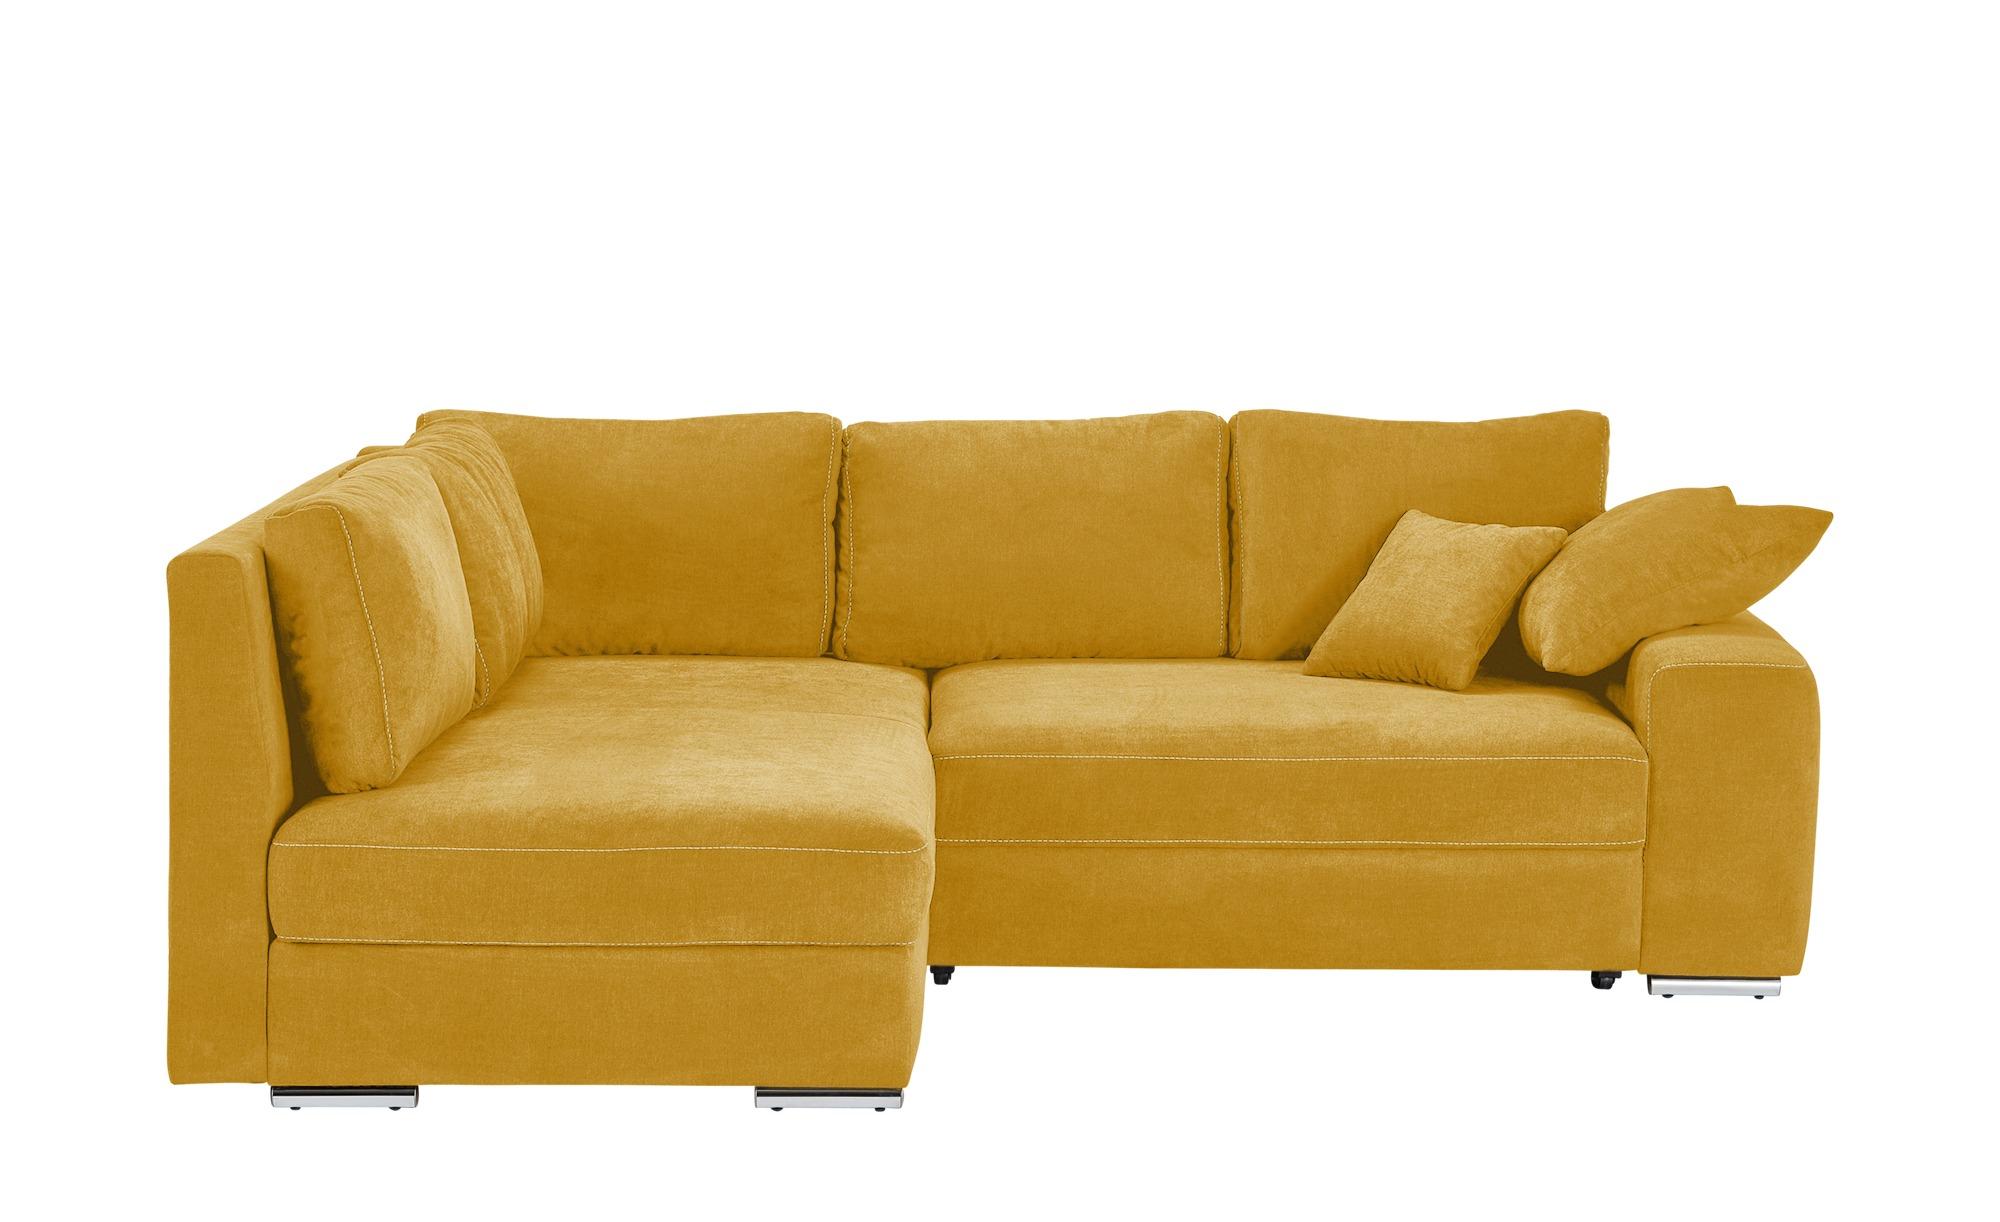 Ecksofa kaila deluxe breite h he 90 cm gelb online for Ecksofa 1 90